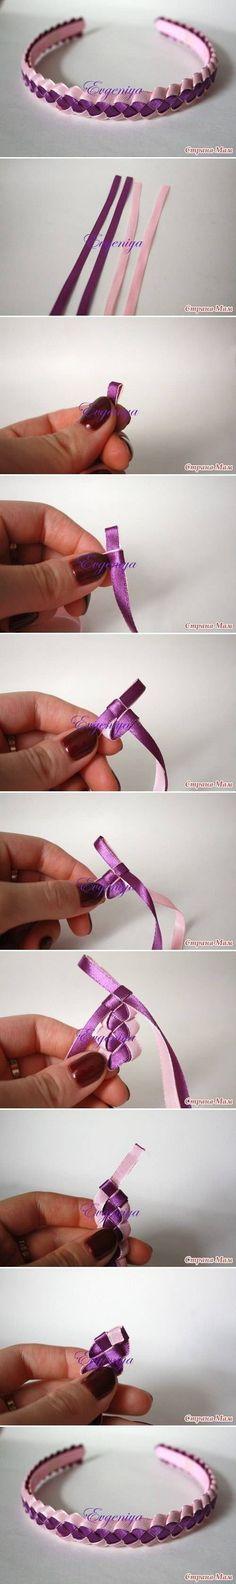 DIY 4 Strips Weaving DIY Projects | UsefulDIY.com